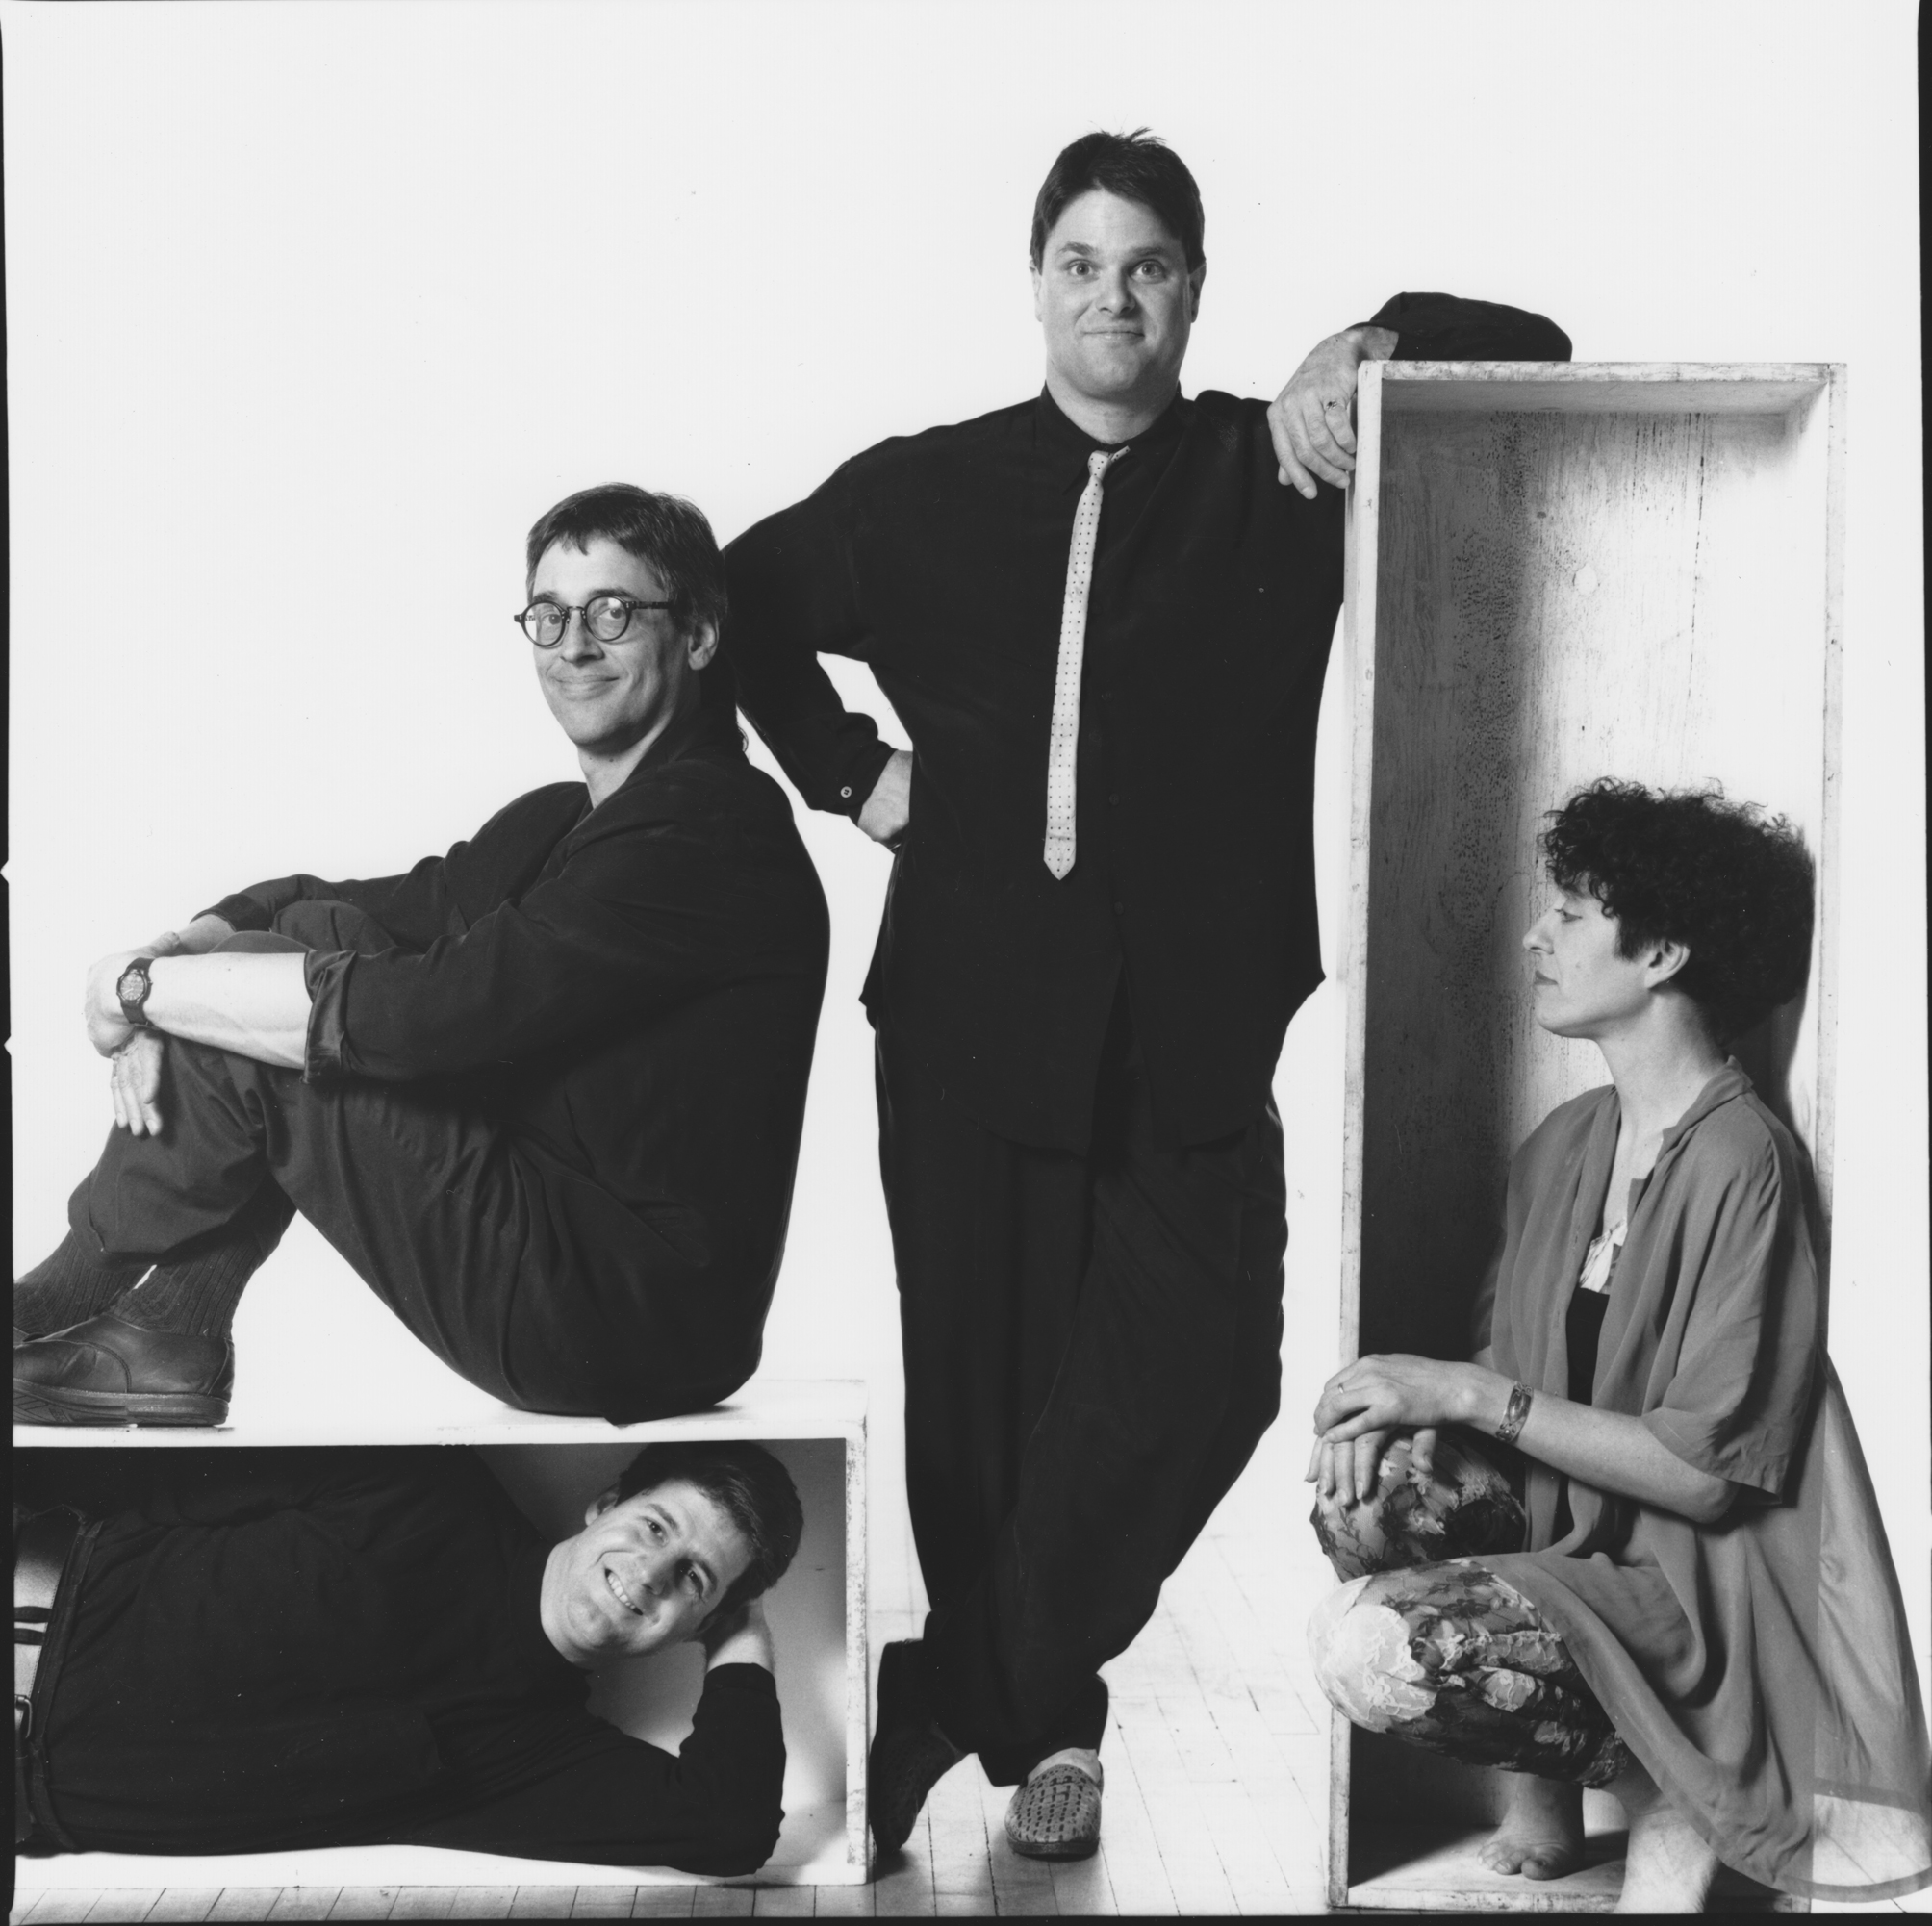 Joe, Richard, Matthew, Janie - photo: Lois Greenfield